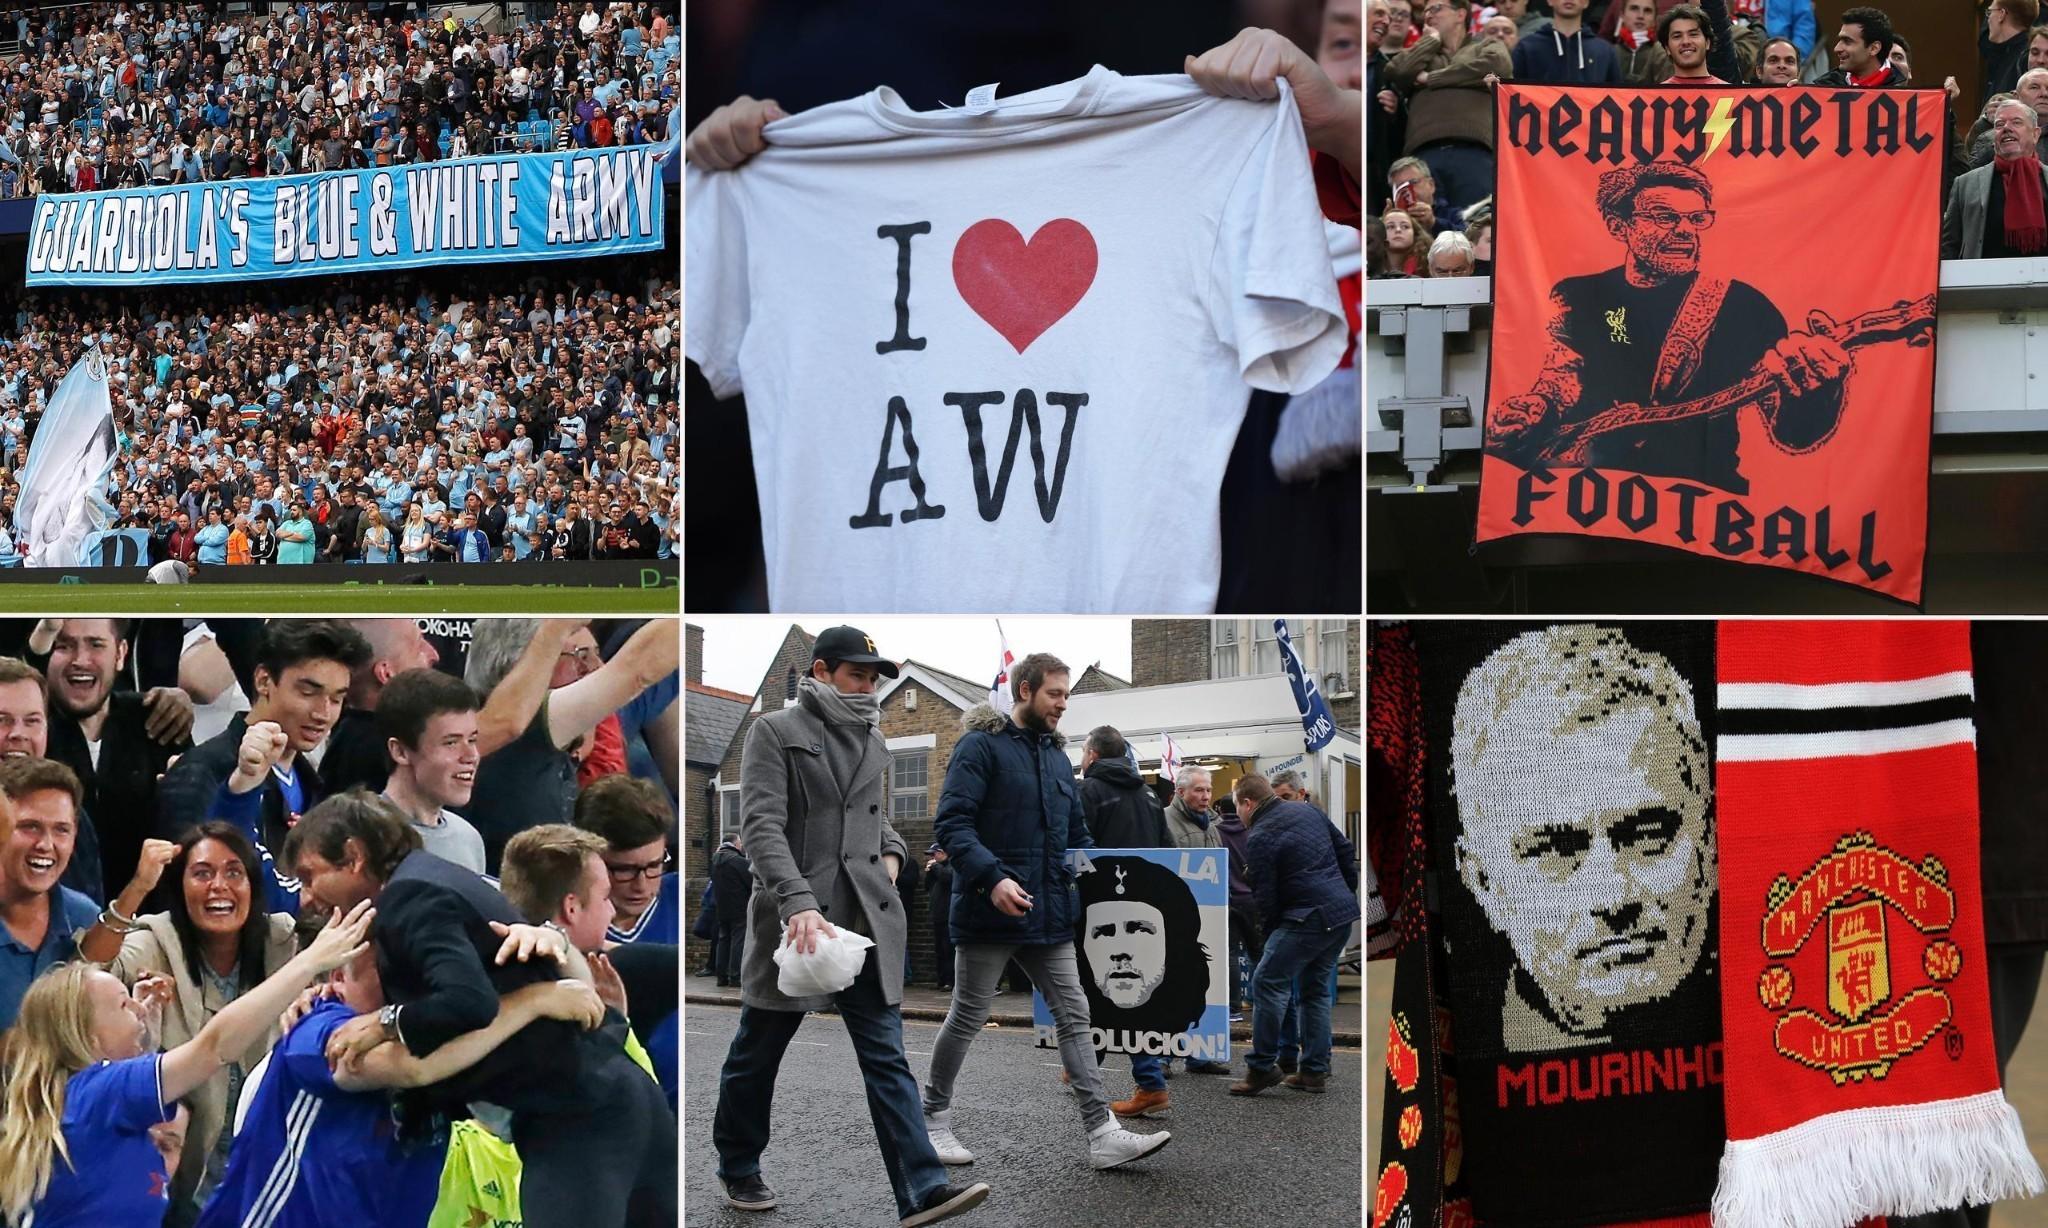 Premier League vulnerabilities add to the intrigue among a putative Big Six